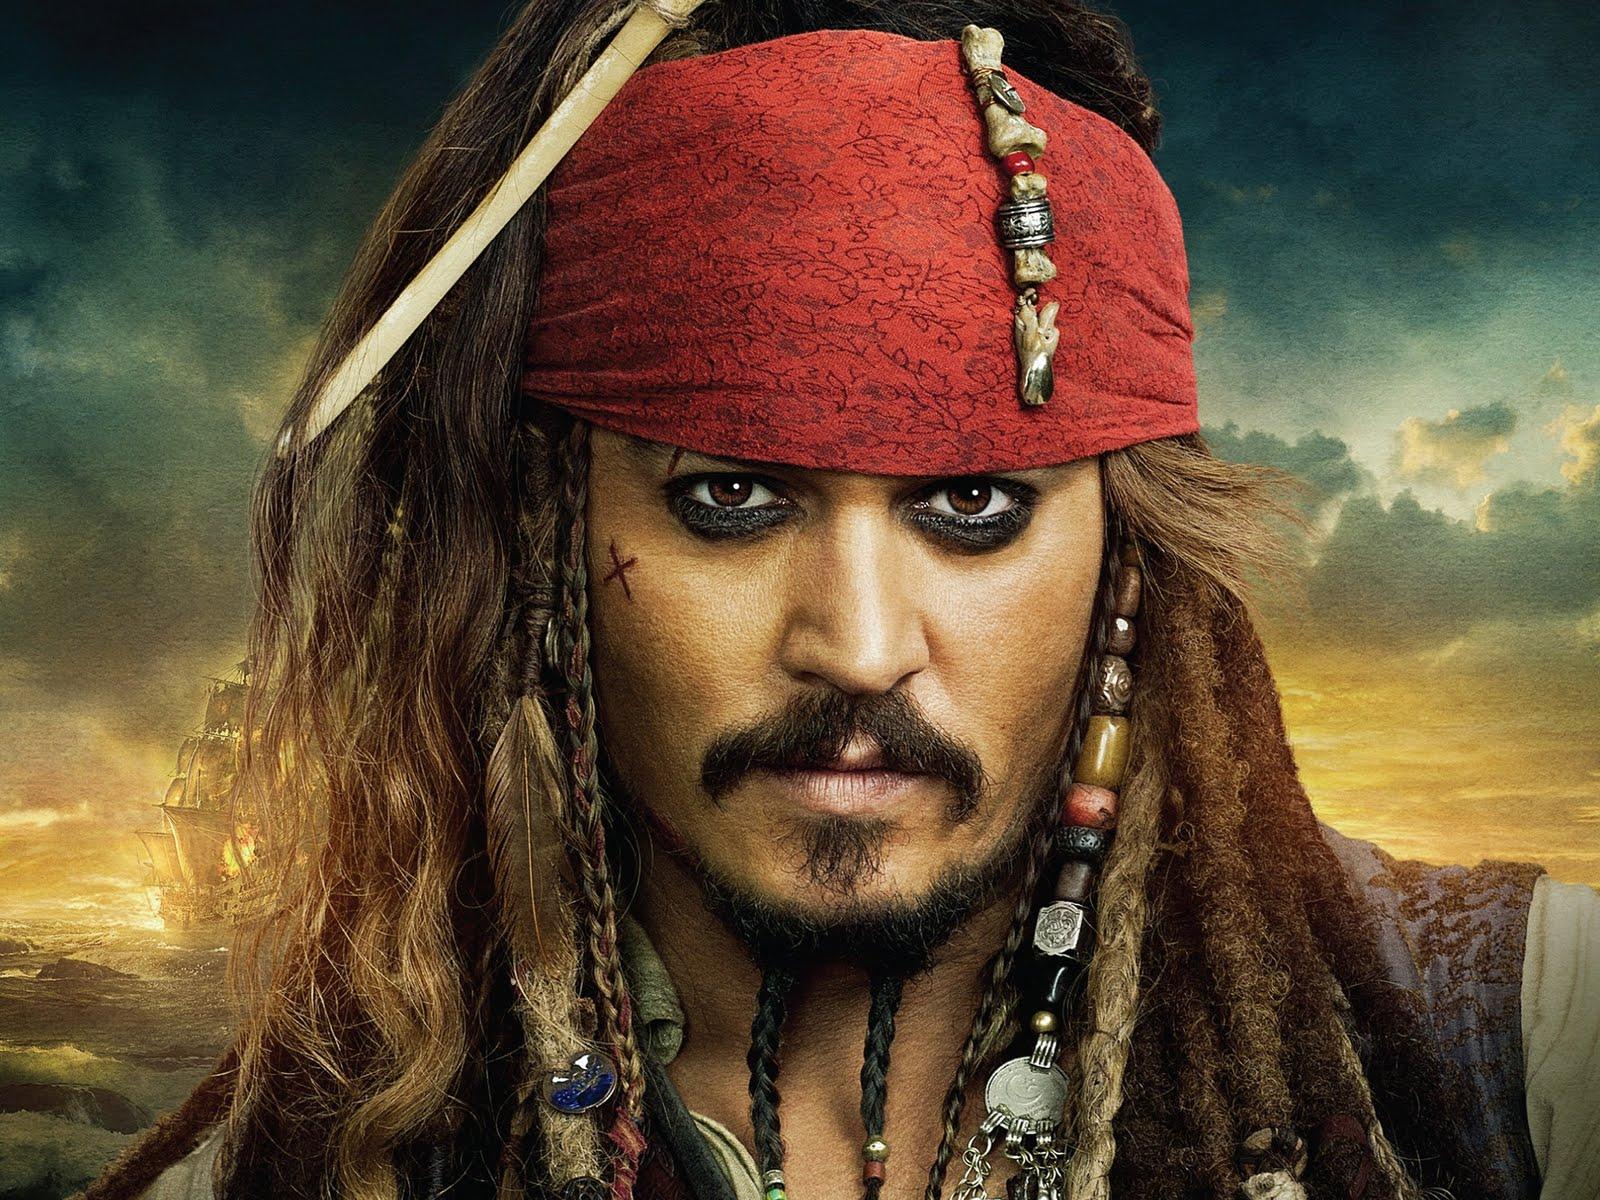 hd desktop wallpapers: pirates of the caribbean wallpapers, desktop